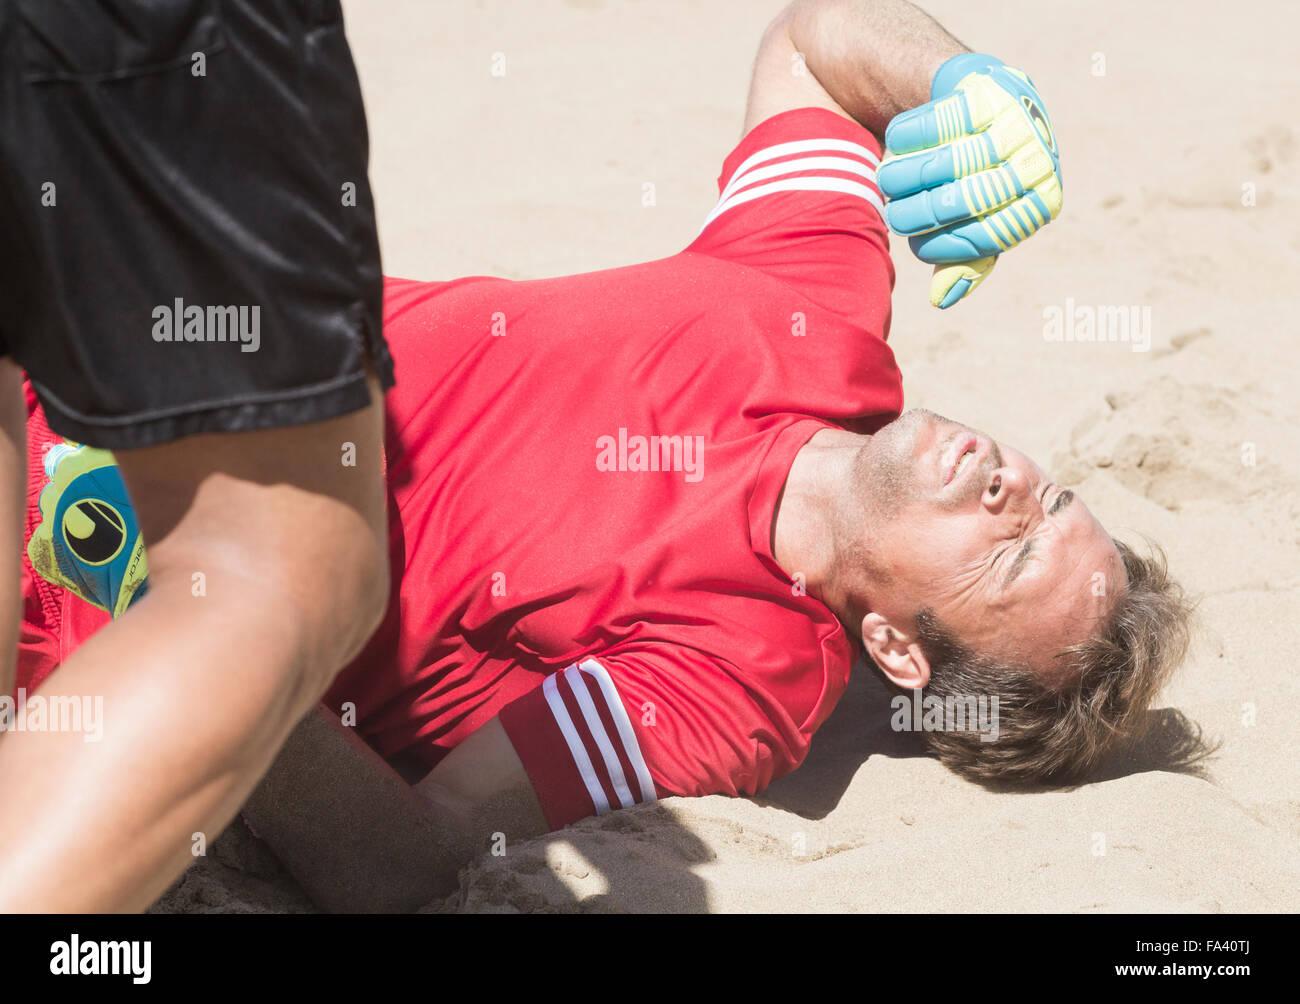 Injured goalkeeper at beach football tournament in Spain - Stock Image